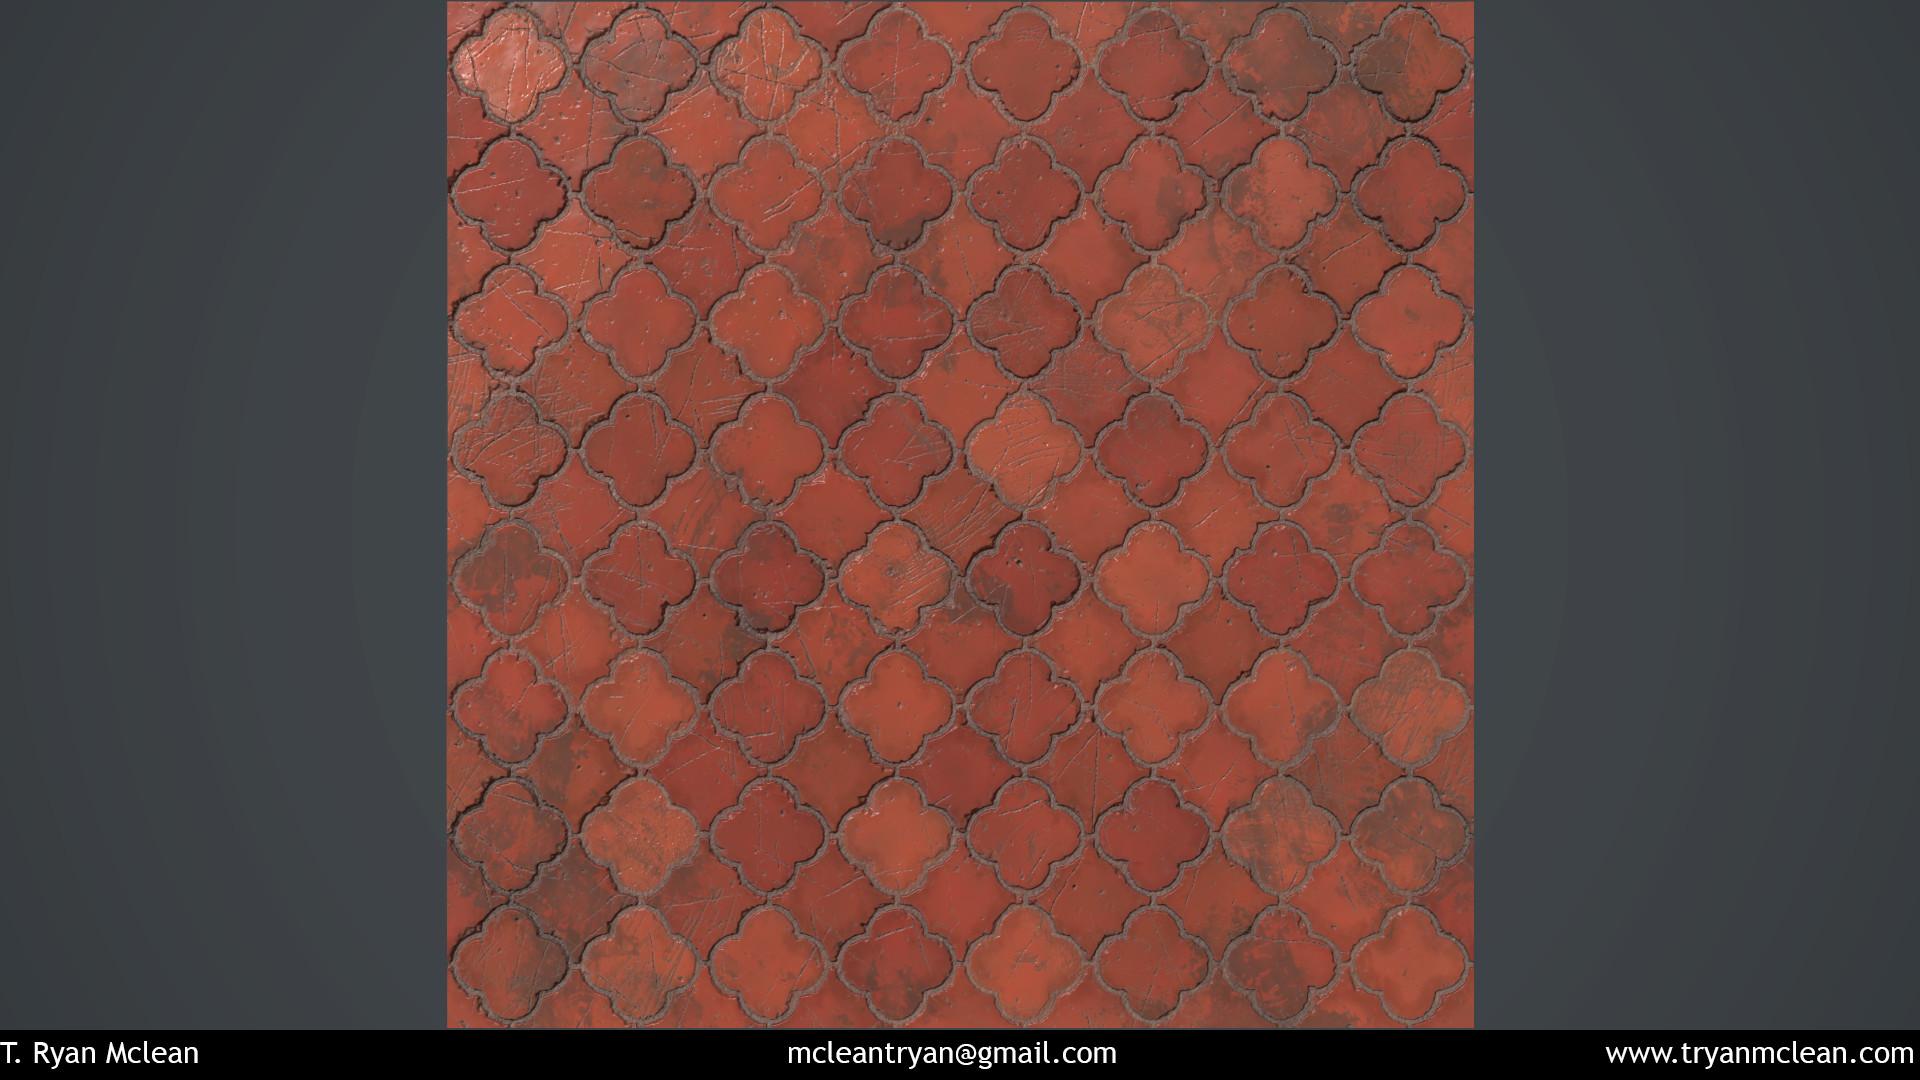 T ryan mclean terracotta tiles 02